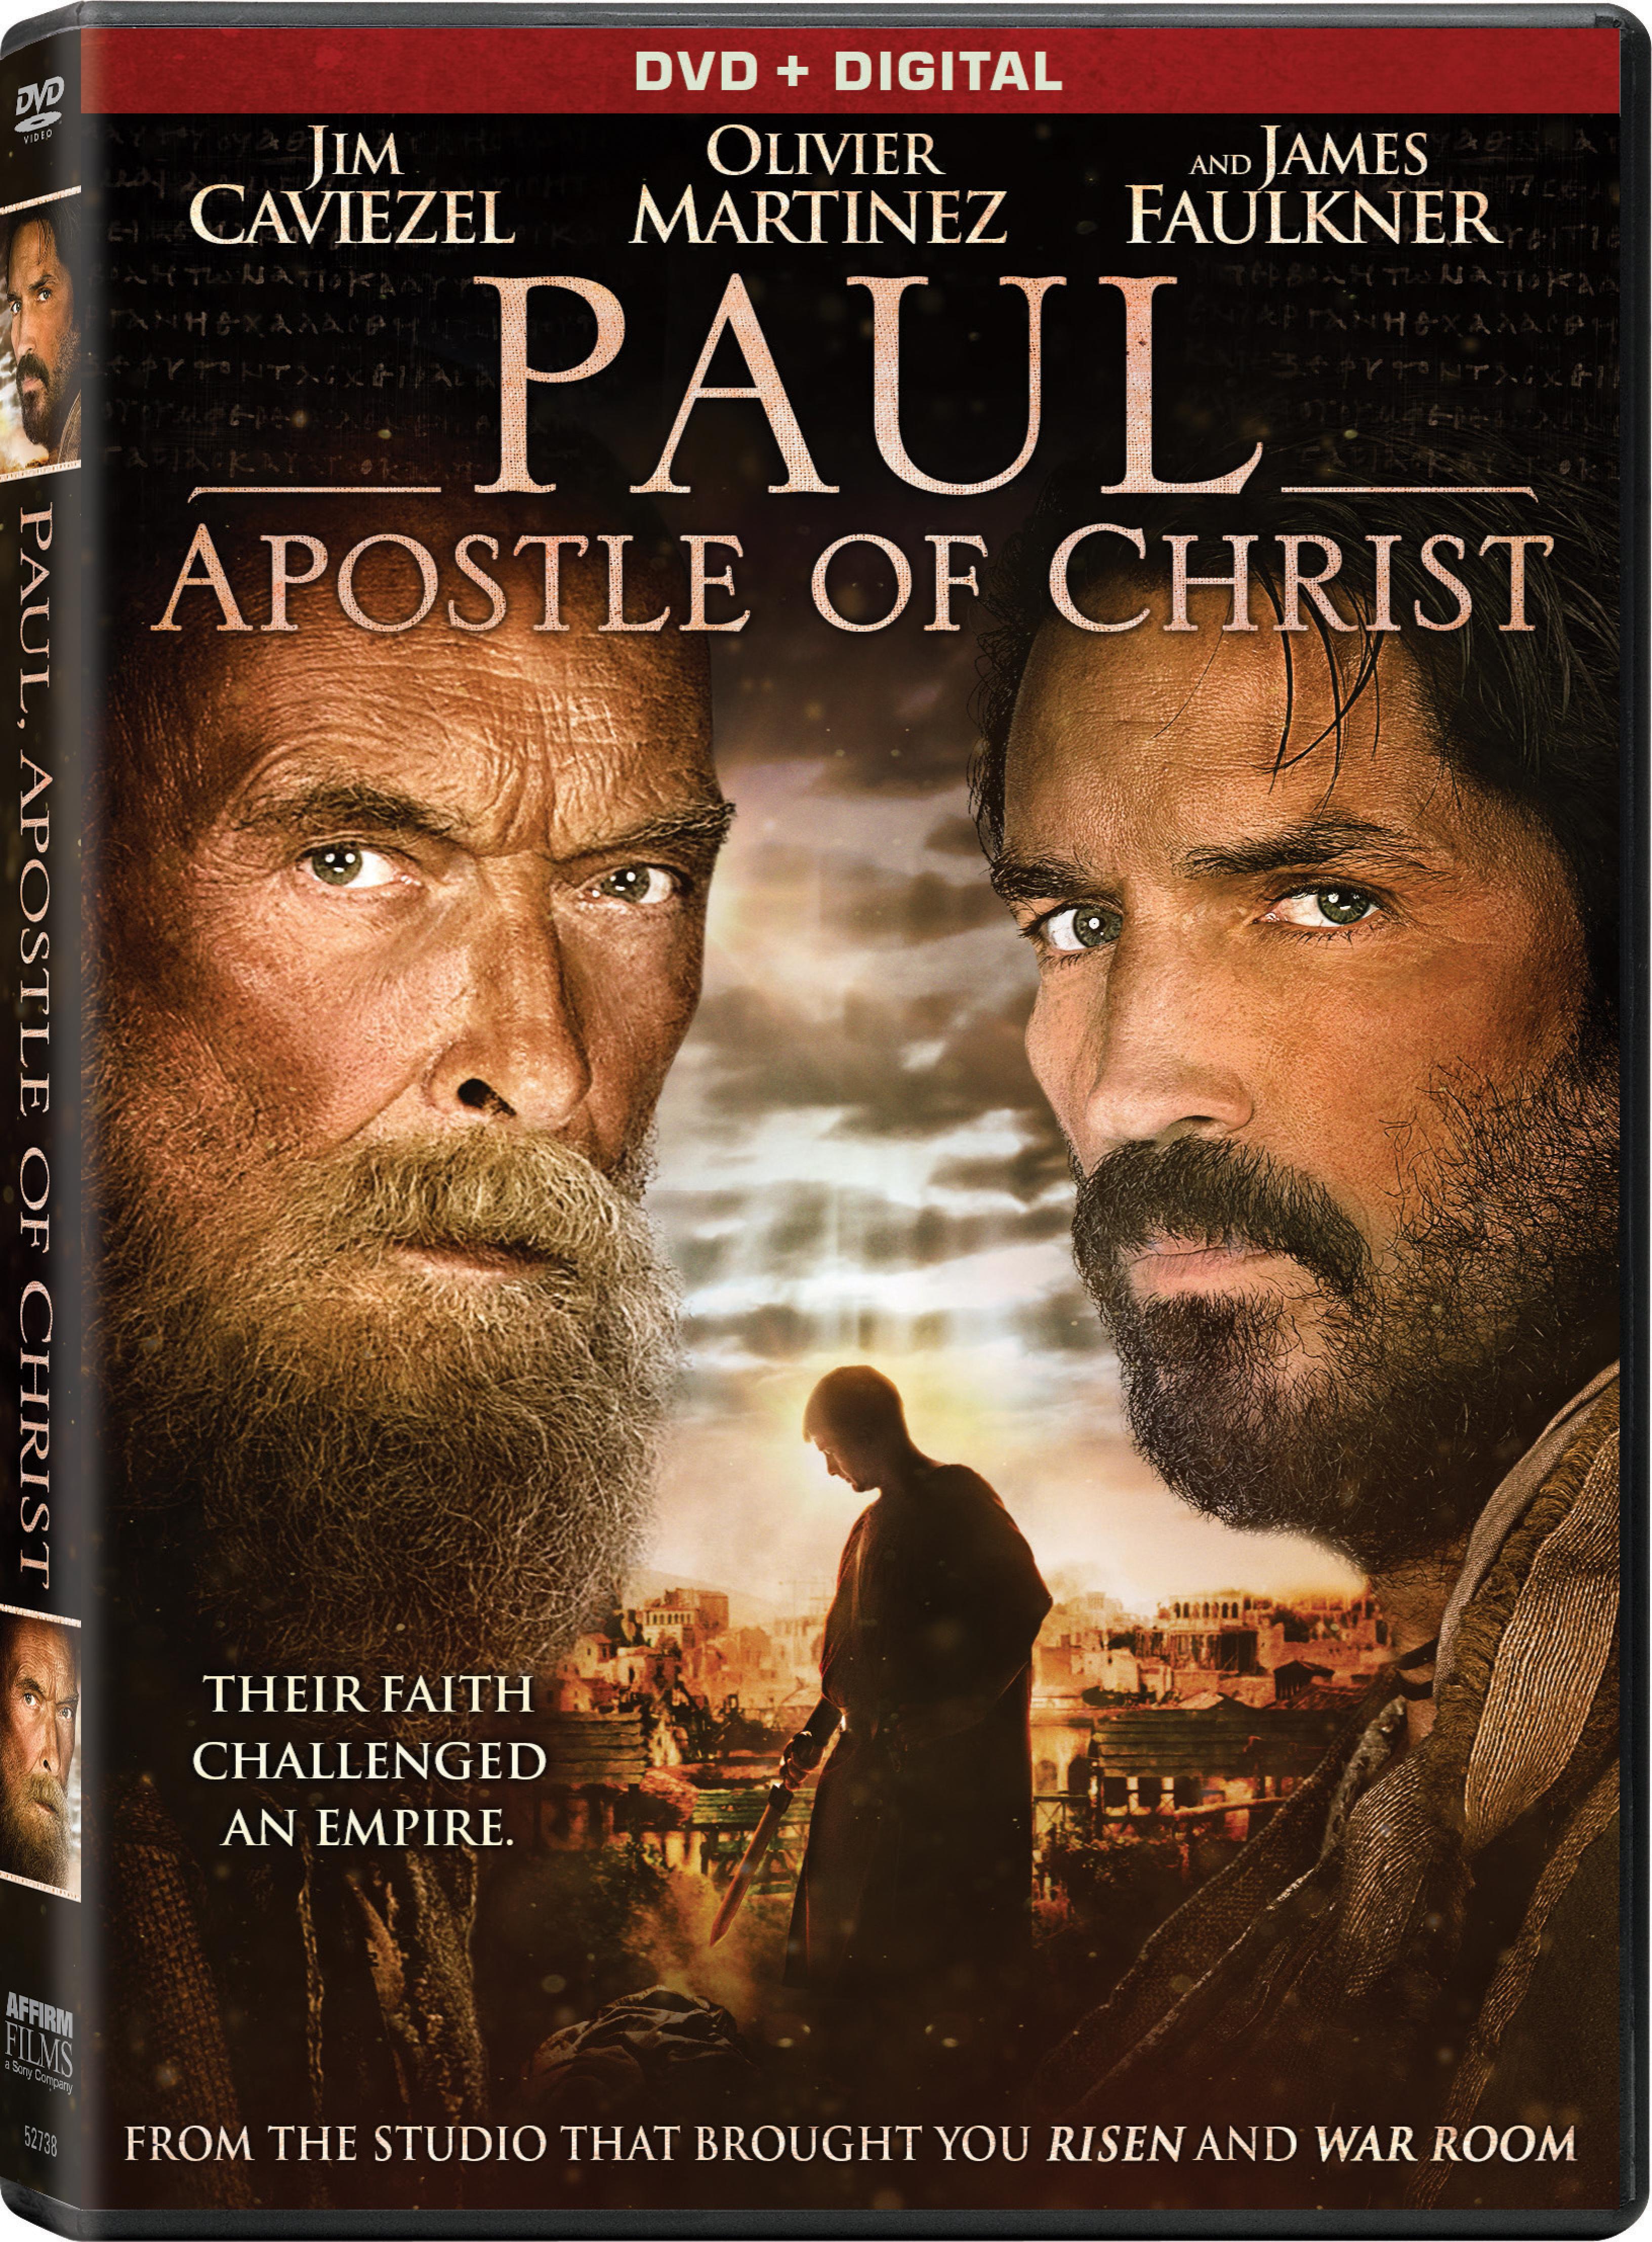 Paul, Apostle of Christ (DVD / Digital) Christ movie